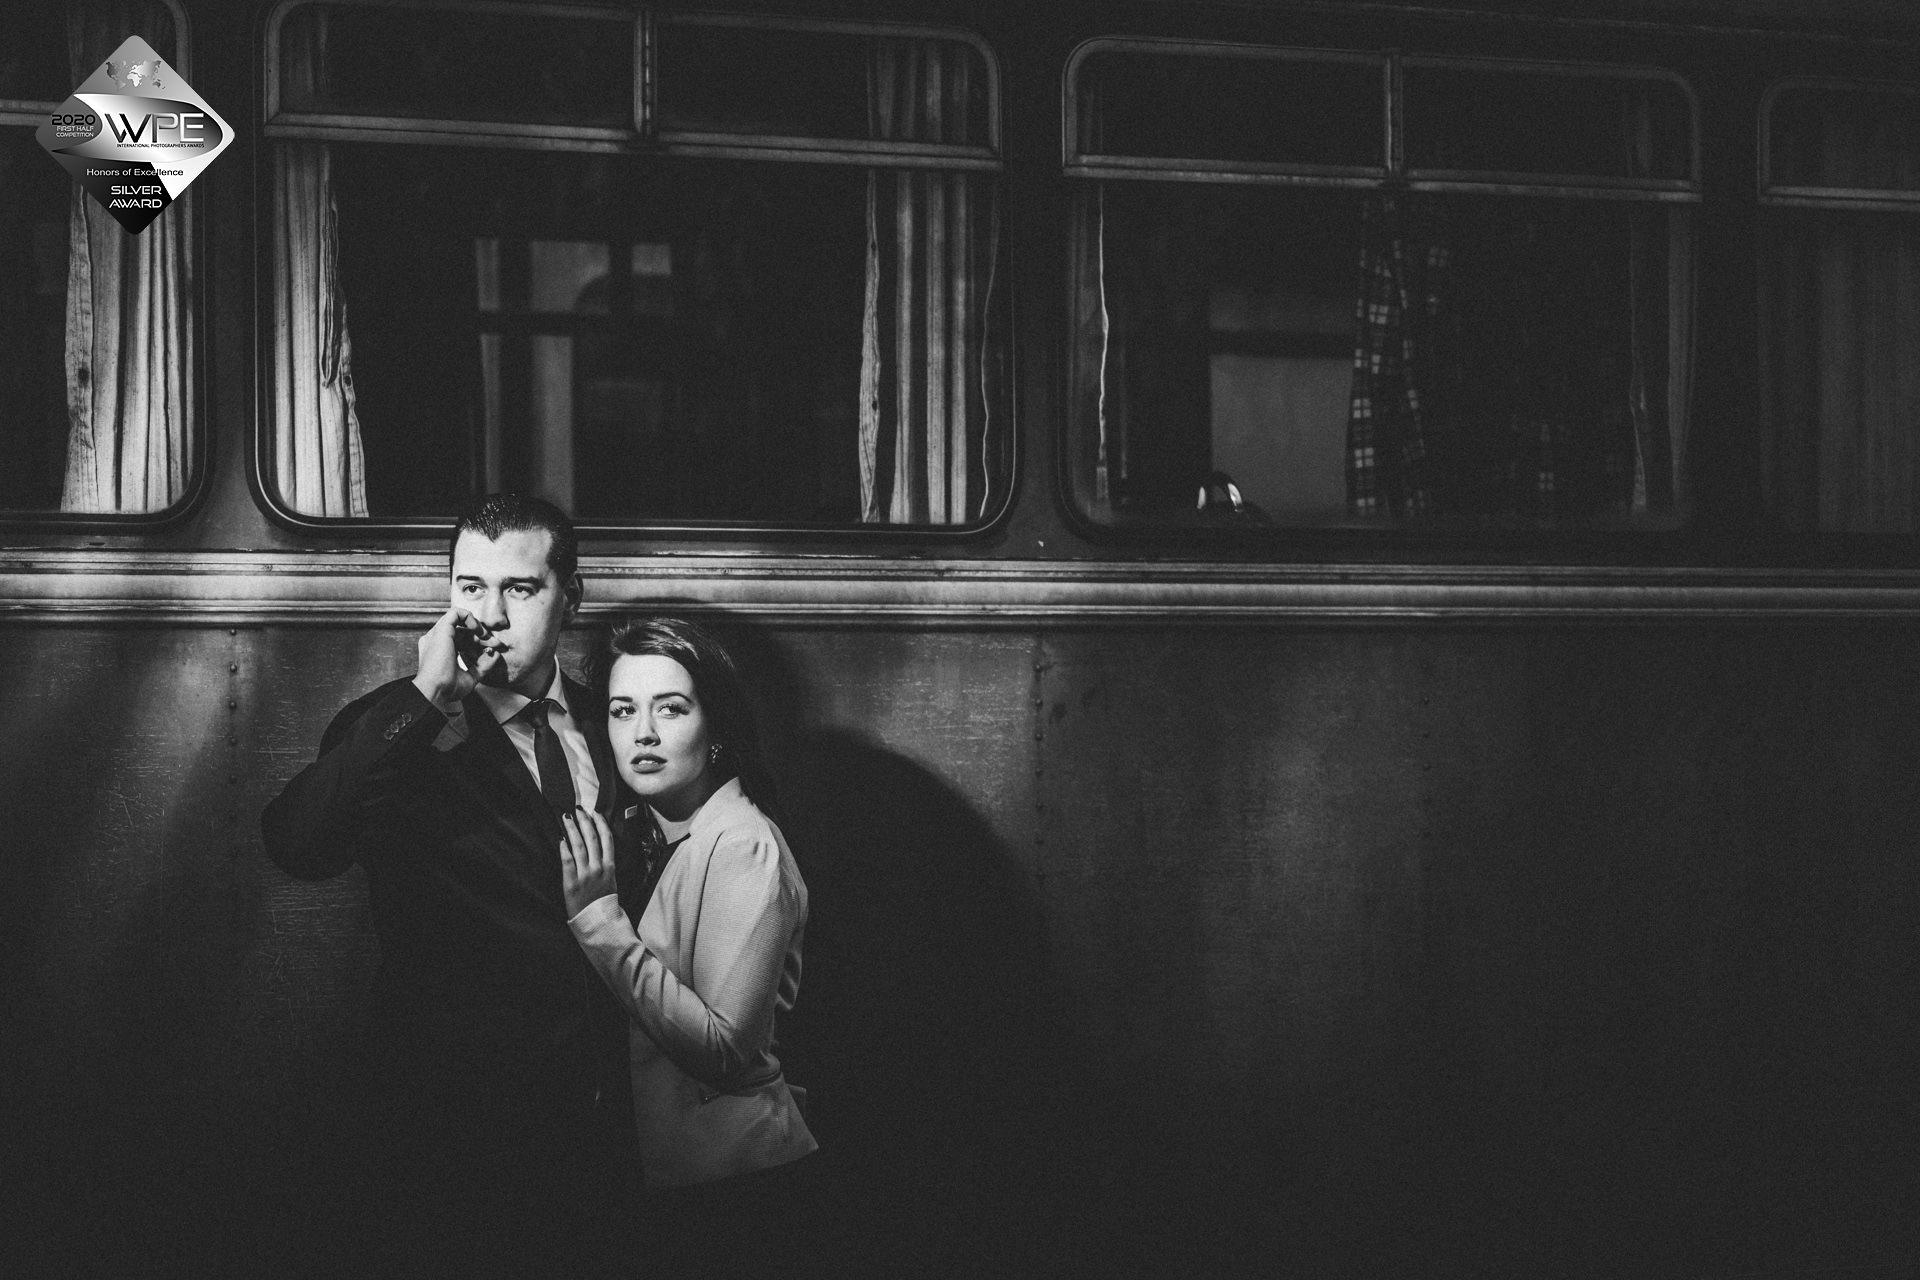 WPE International photography awards - 1st half 2020 - Best wedding photography worldwide